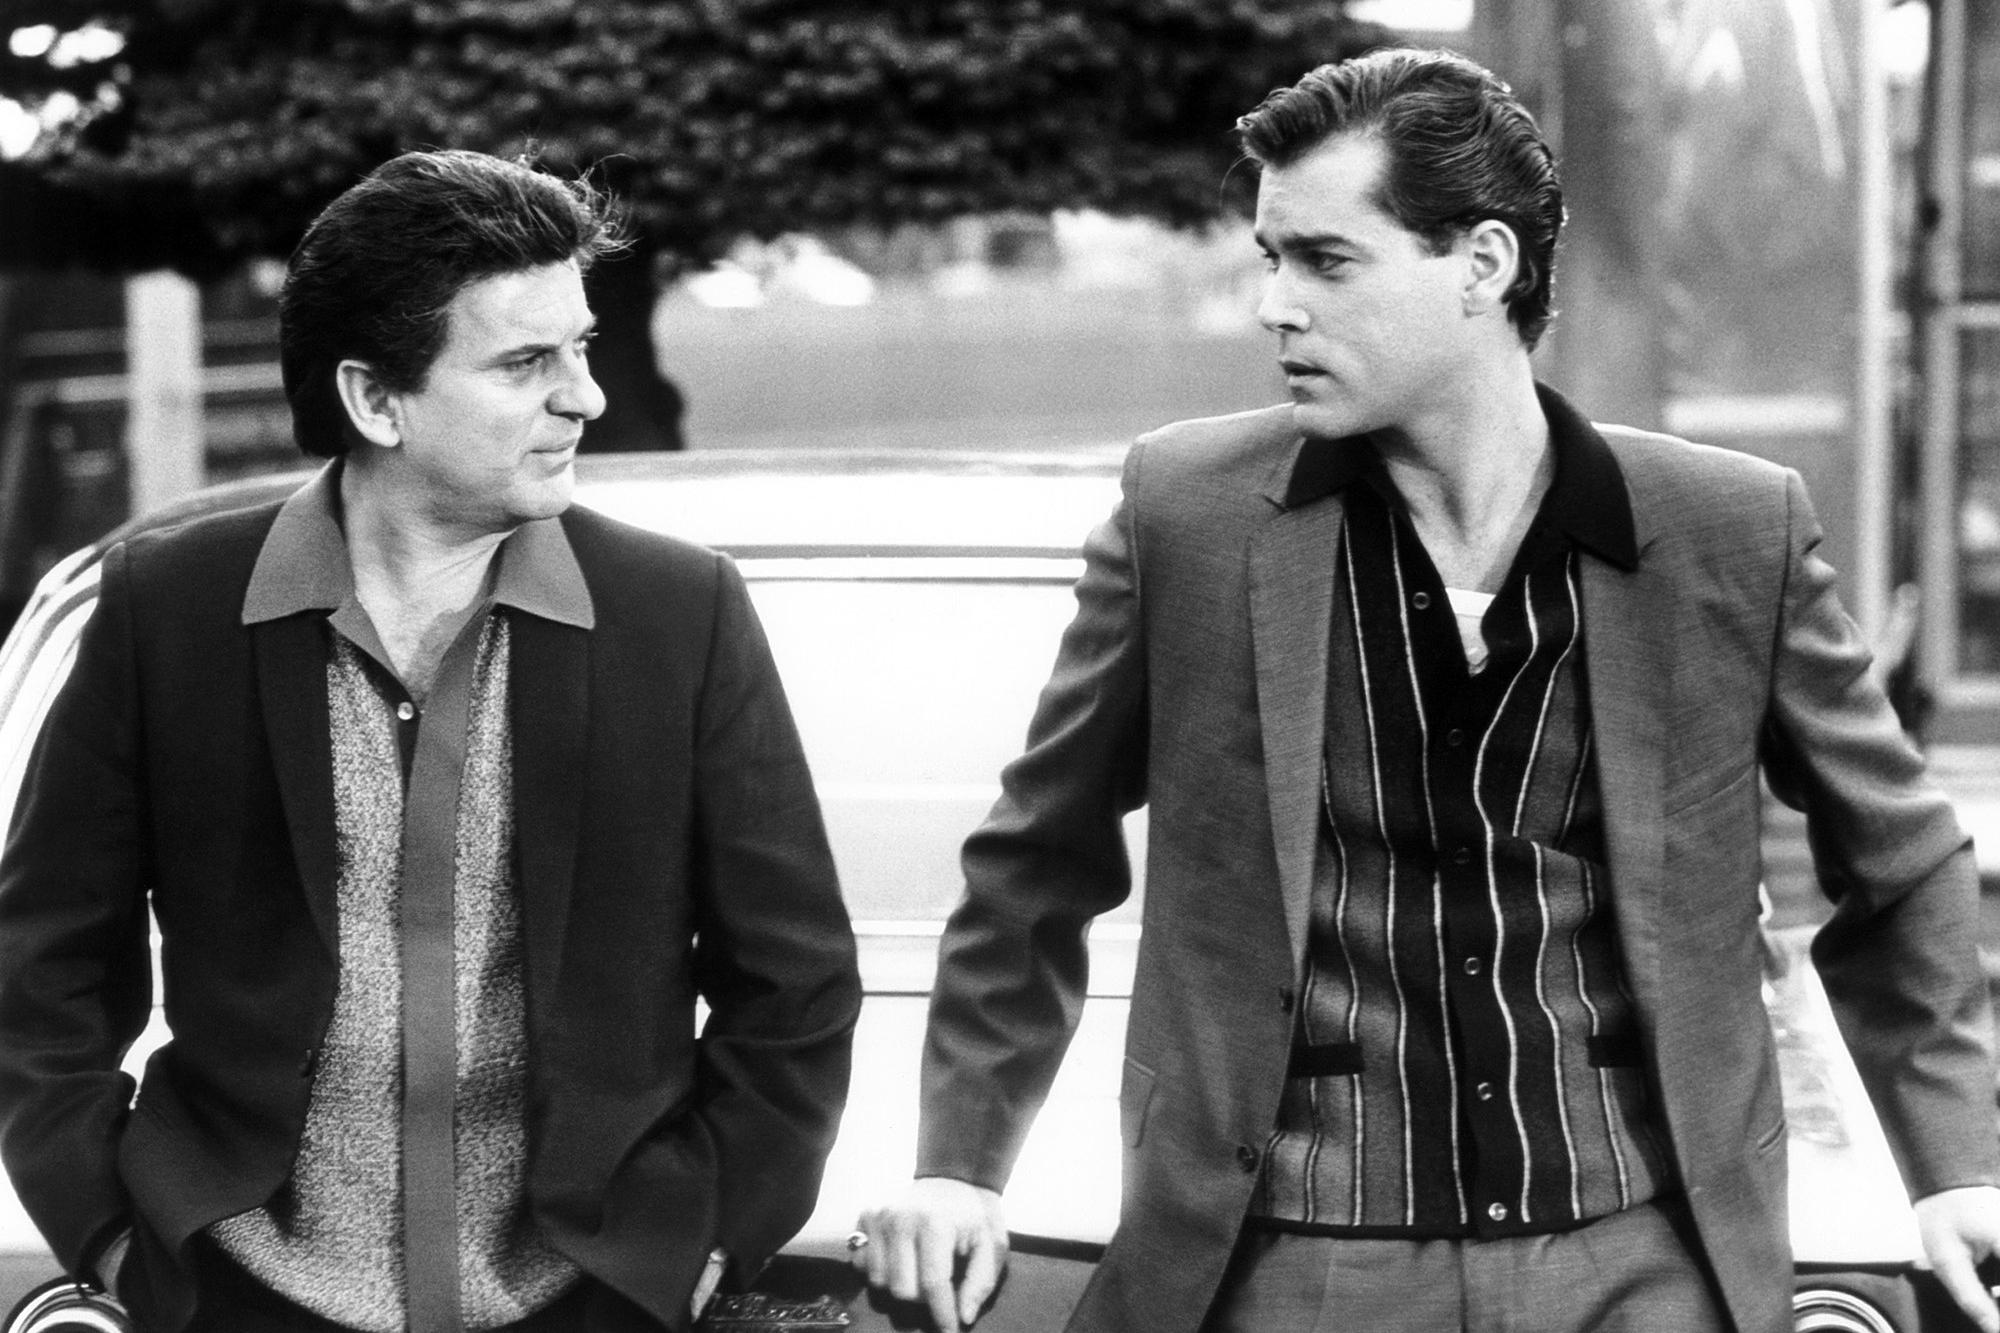 Goodfellas (1990) - Directed by: Martin ScorseseWritten by: Nicholas Pileggi & Martin Scorsese